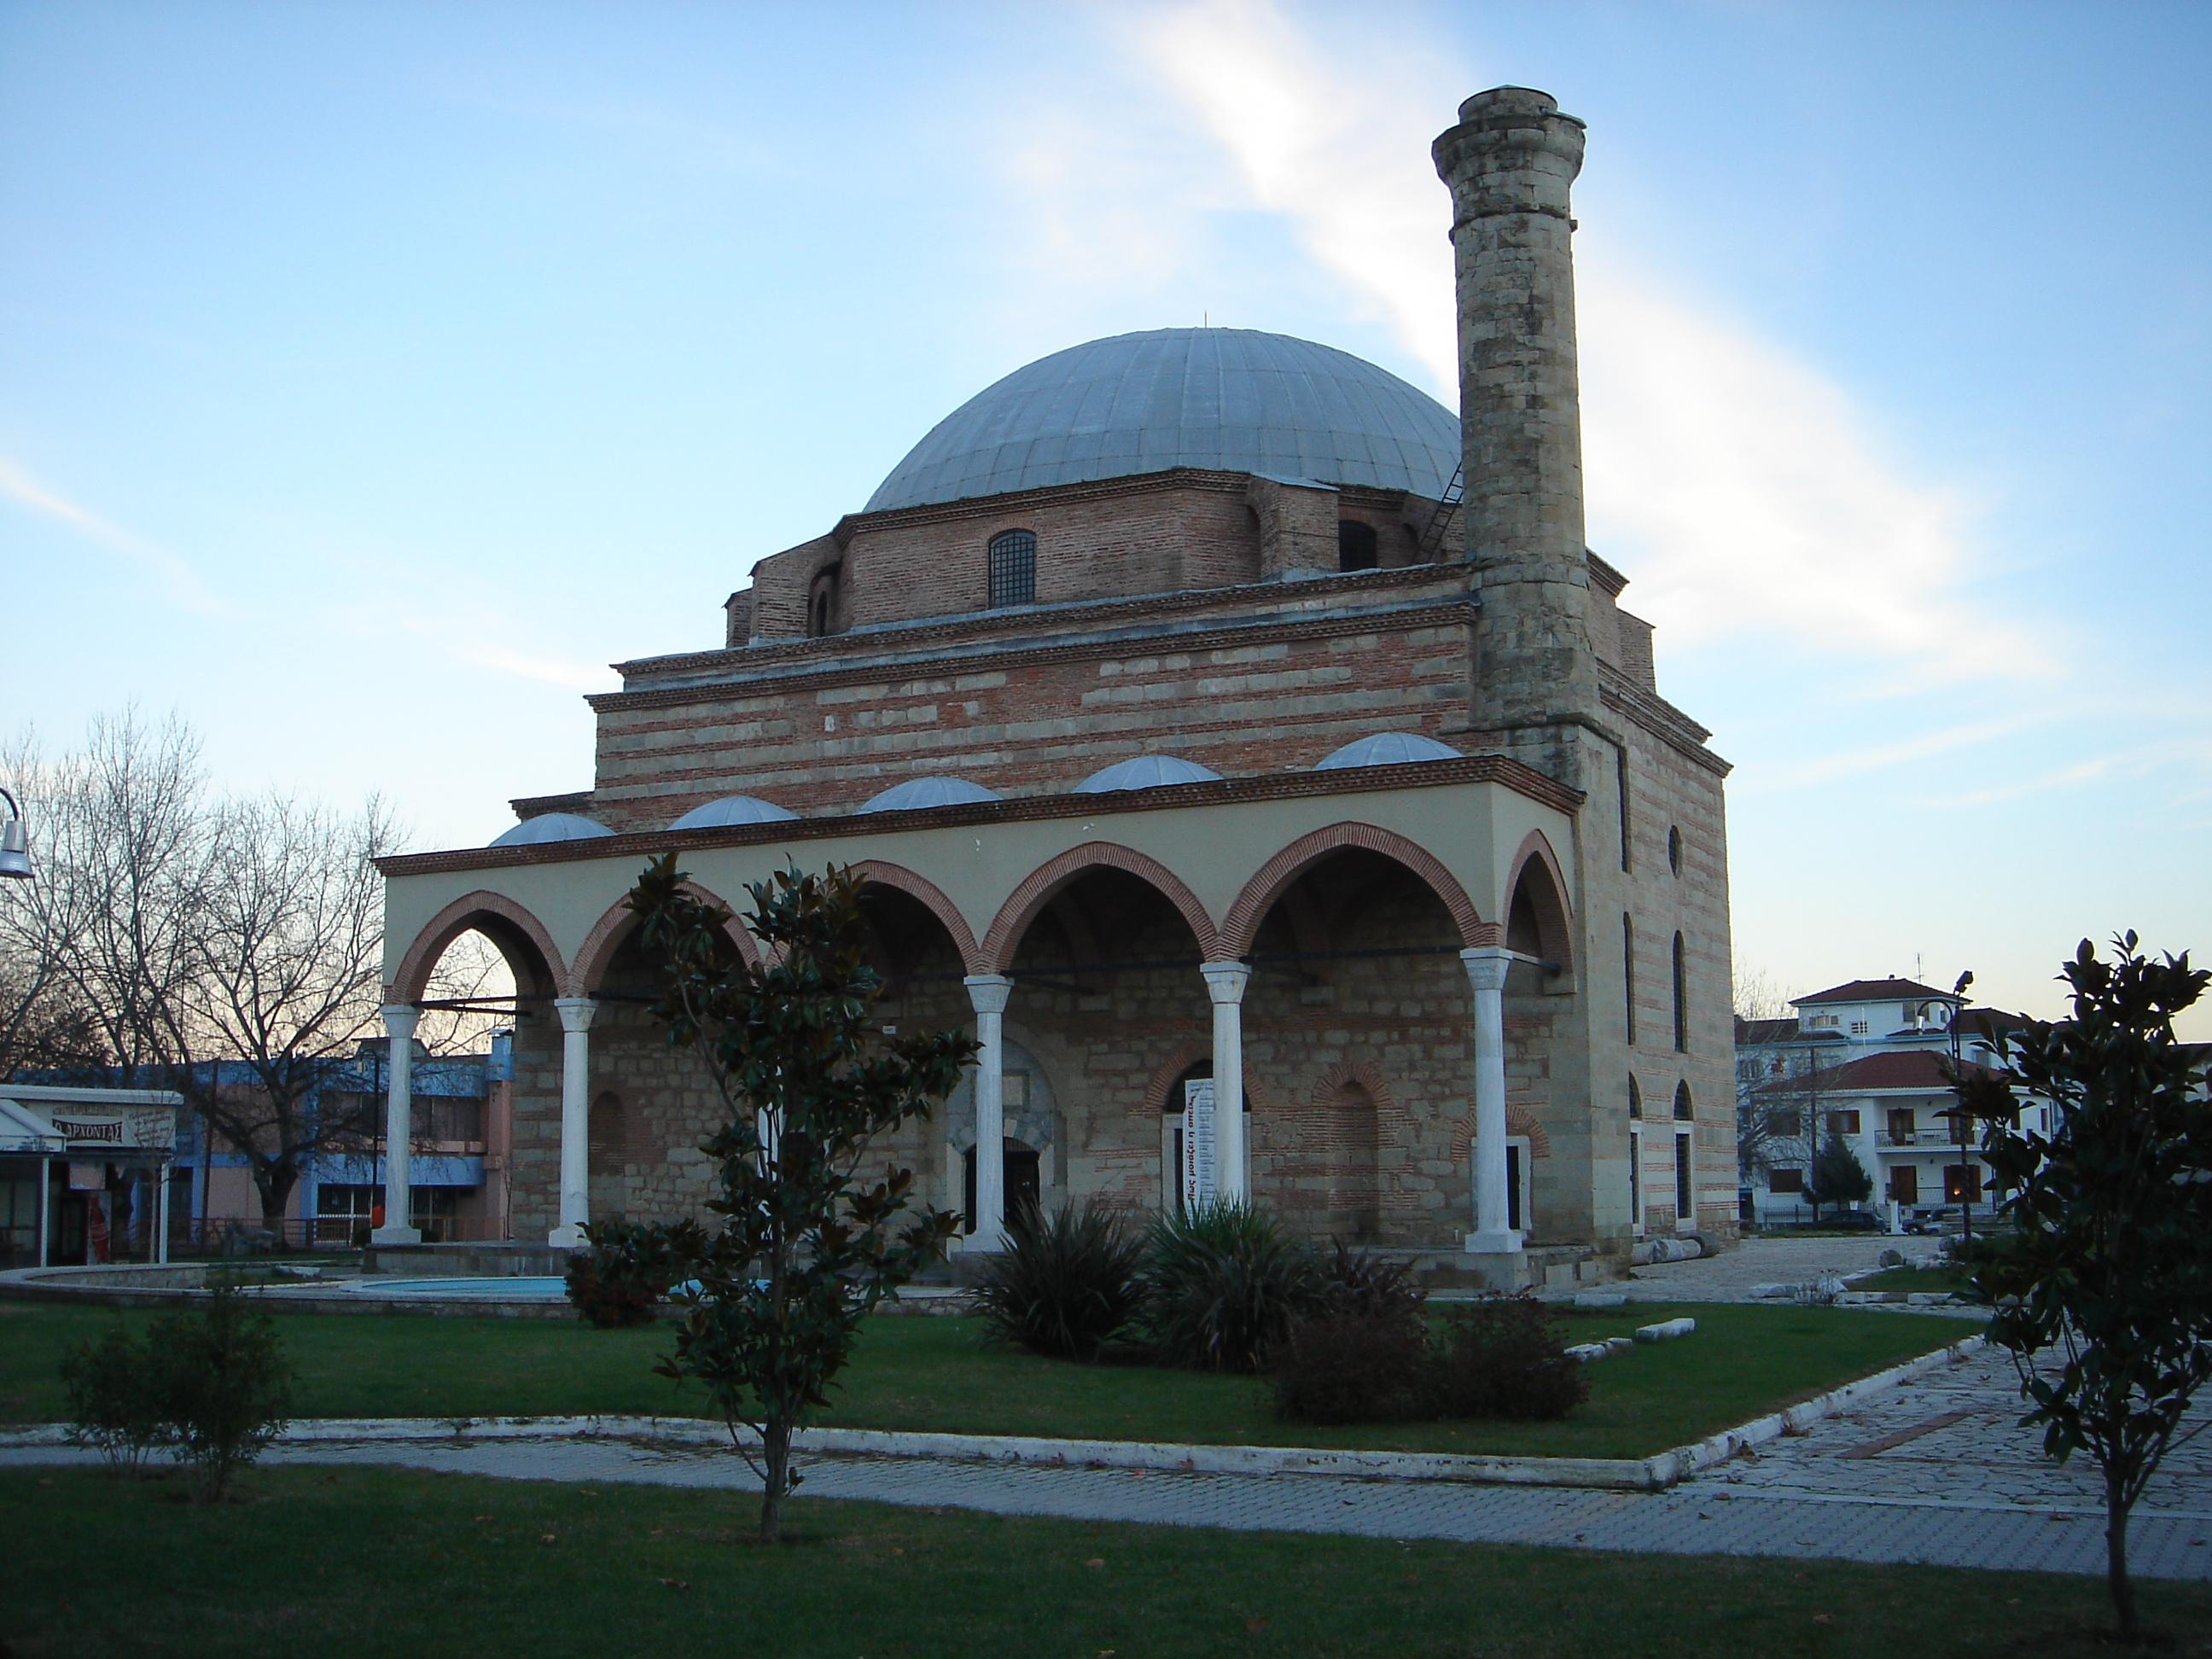 Mosque Wikipedia: File:Koursoum Mosque, Trikala.jpg